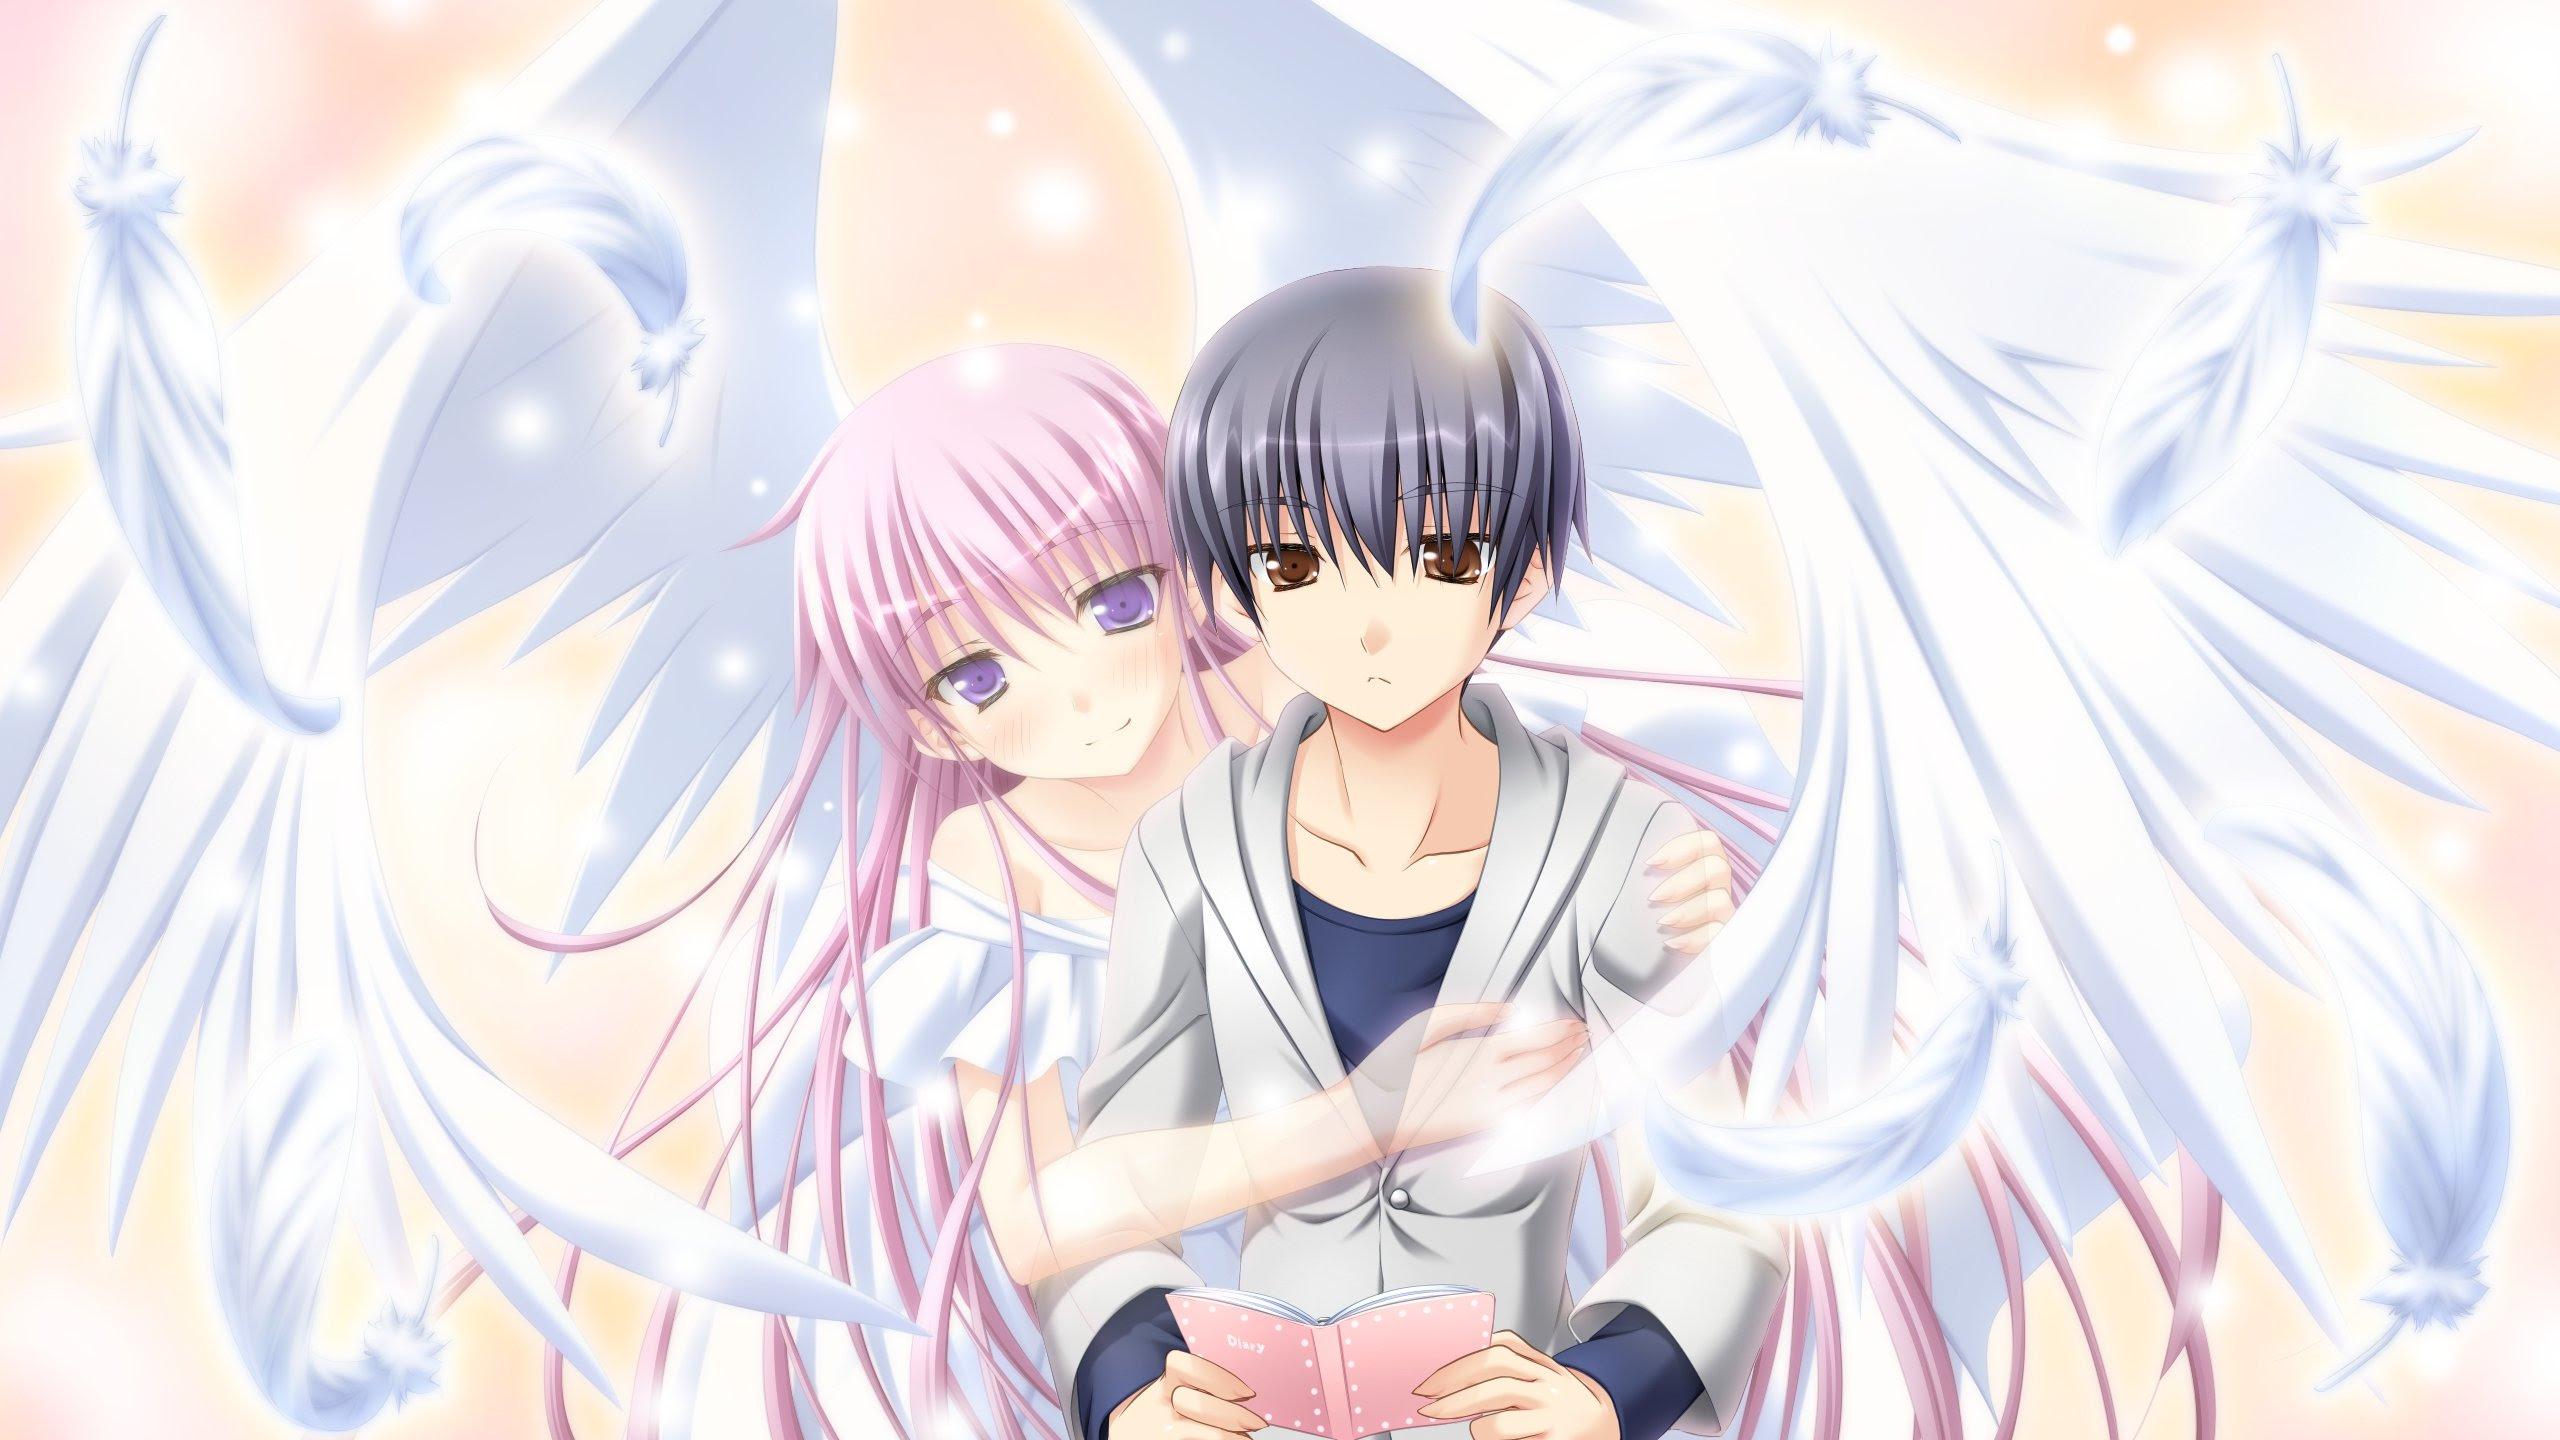 Anime Devil Boy And Girl Anime Wallpapers